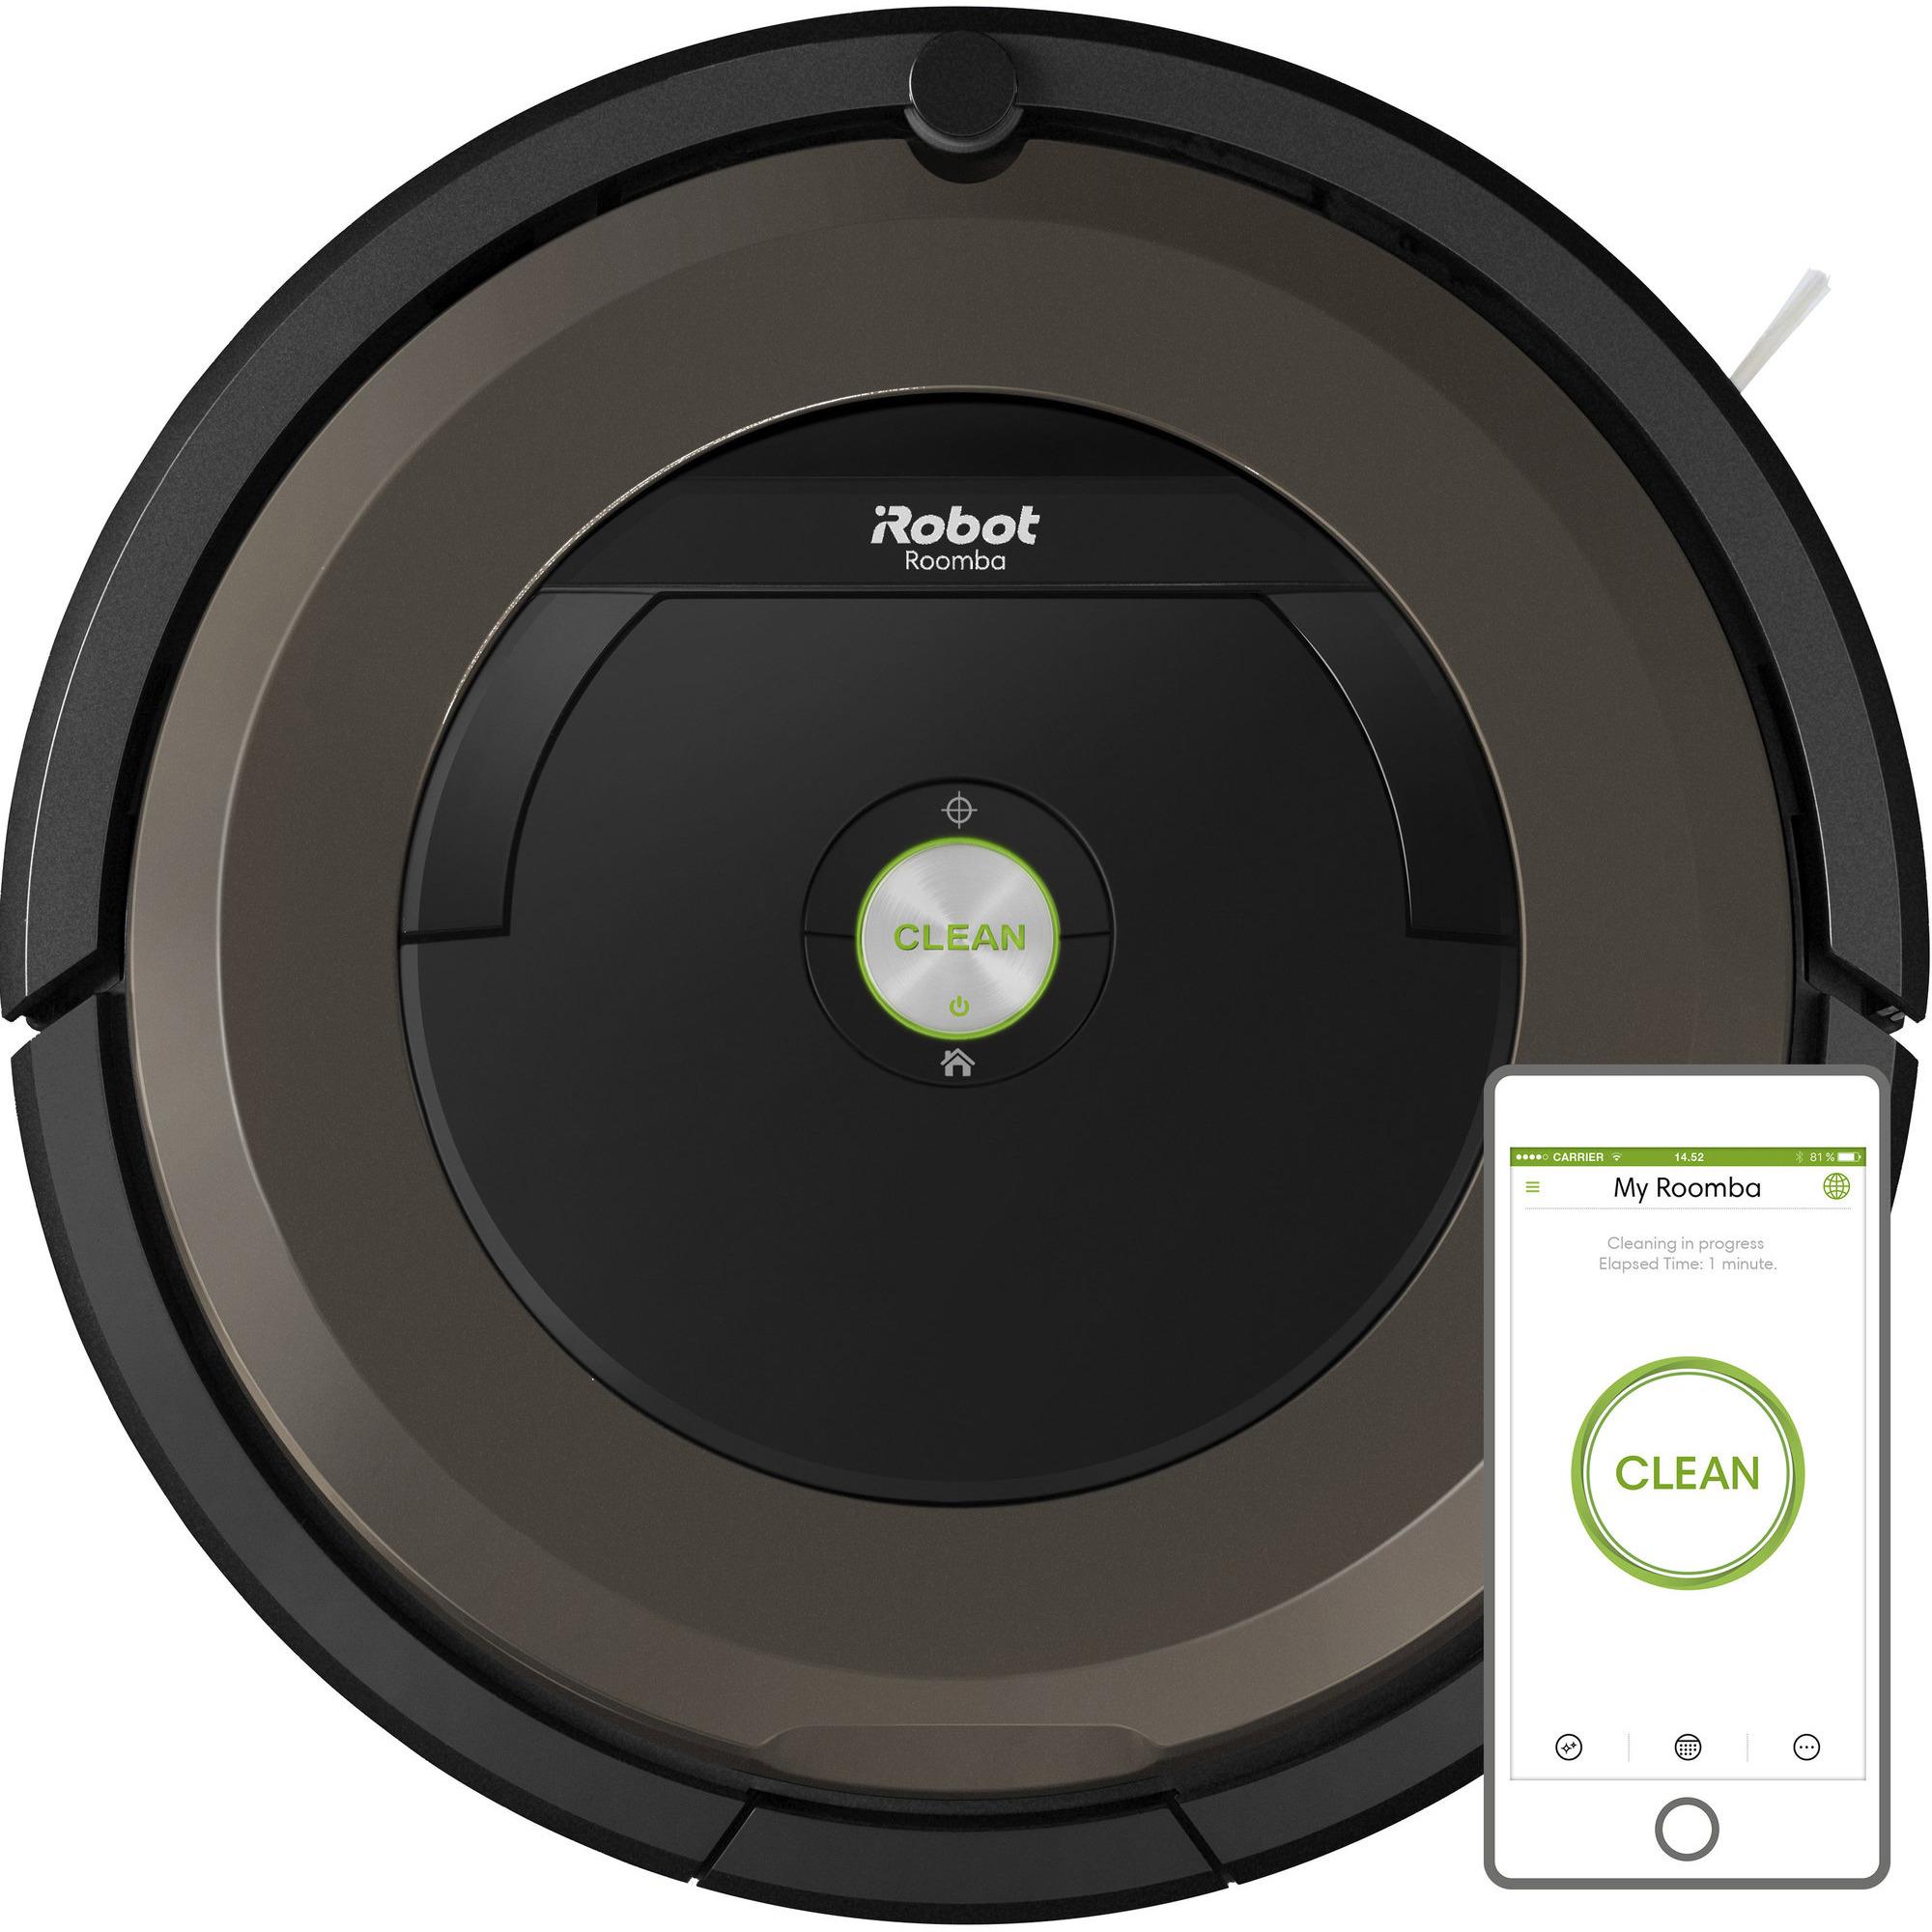 Roomba i7 Plus robotstøvsuger fra iRobot » Gratis Levering